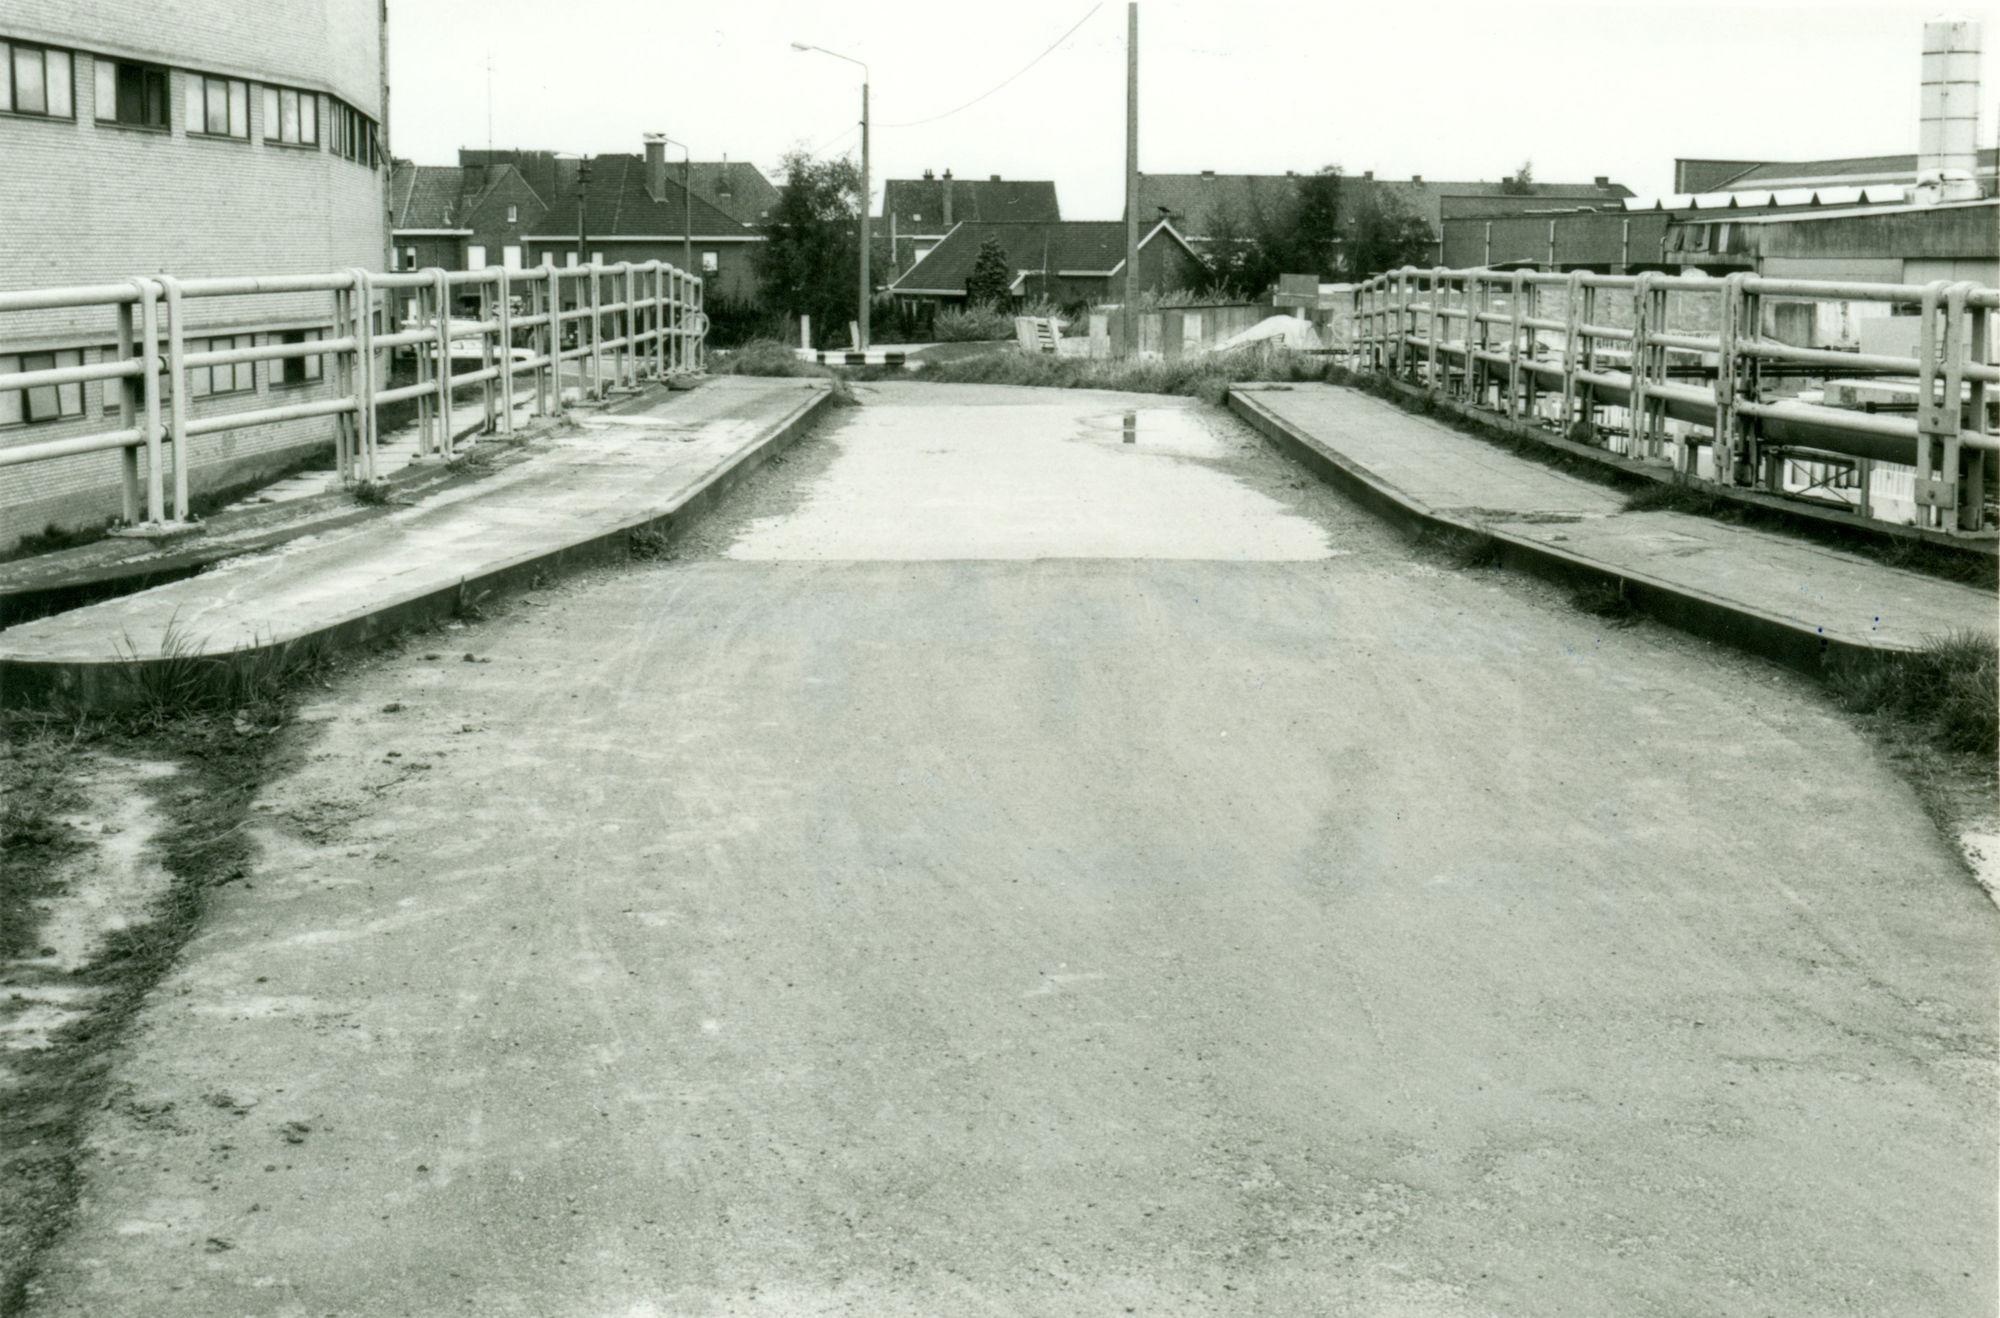 Verbredingswerken van het Kanaal Bossuit-Kortrijk aan de Visserskaai 1981